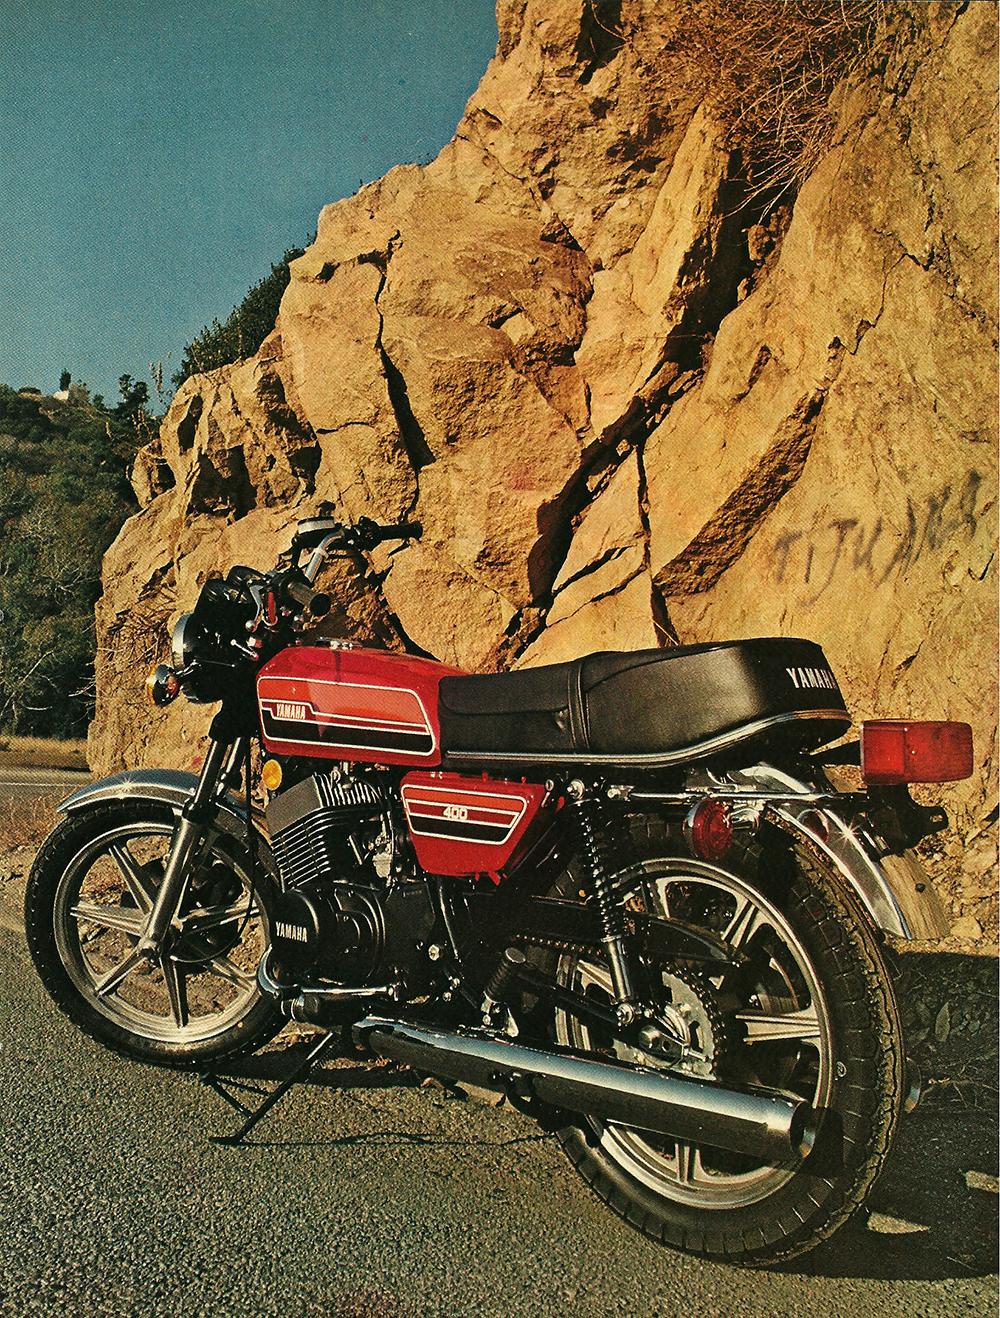 1976 Yamaha RD400C road test 2.jpg